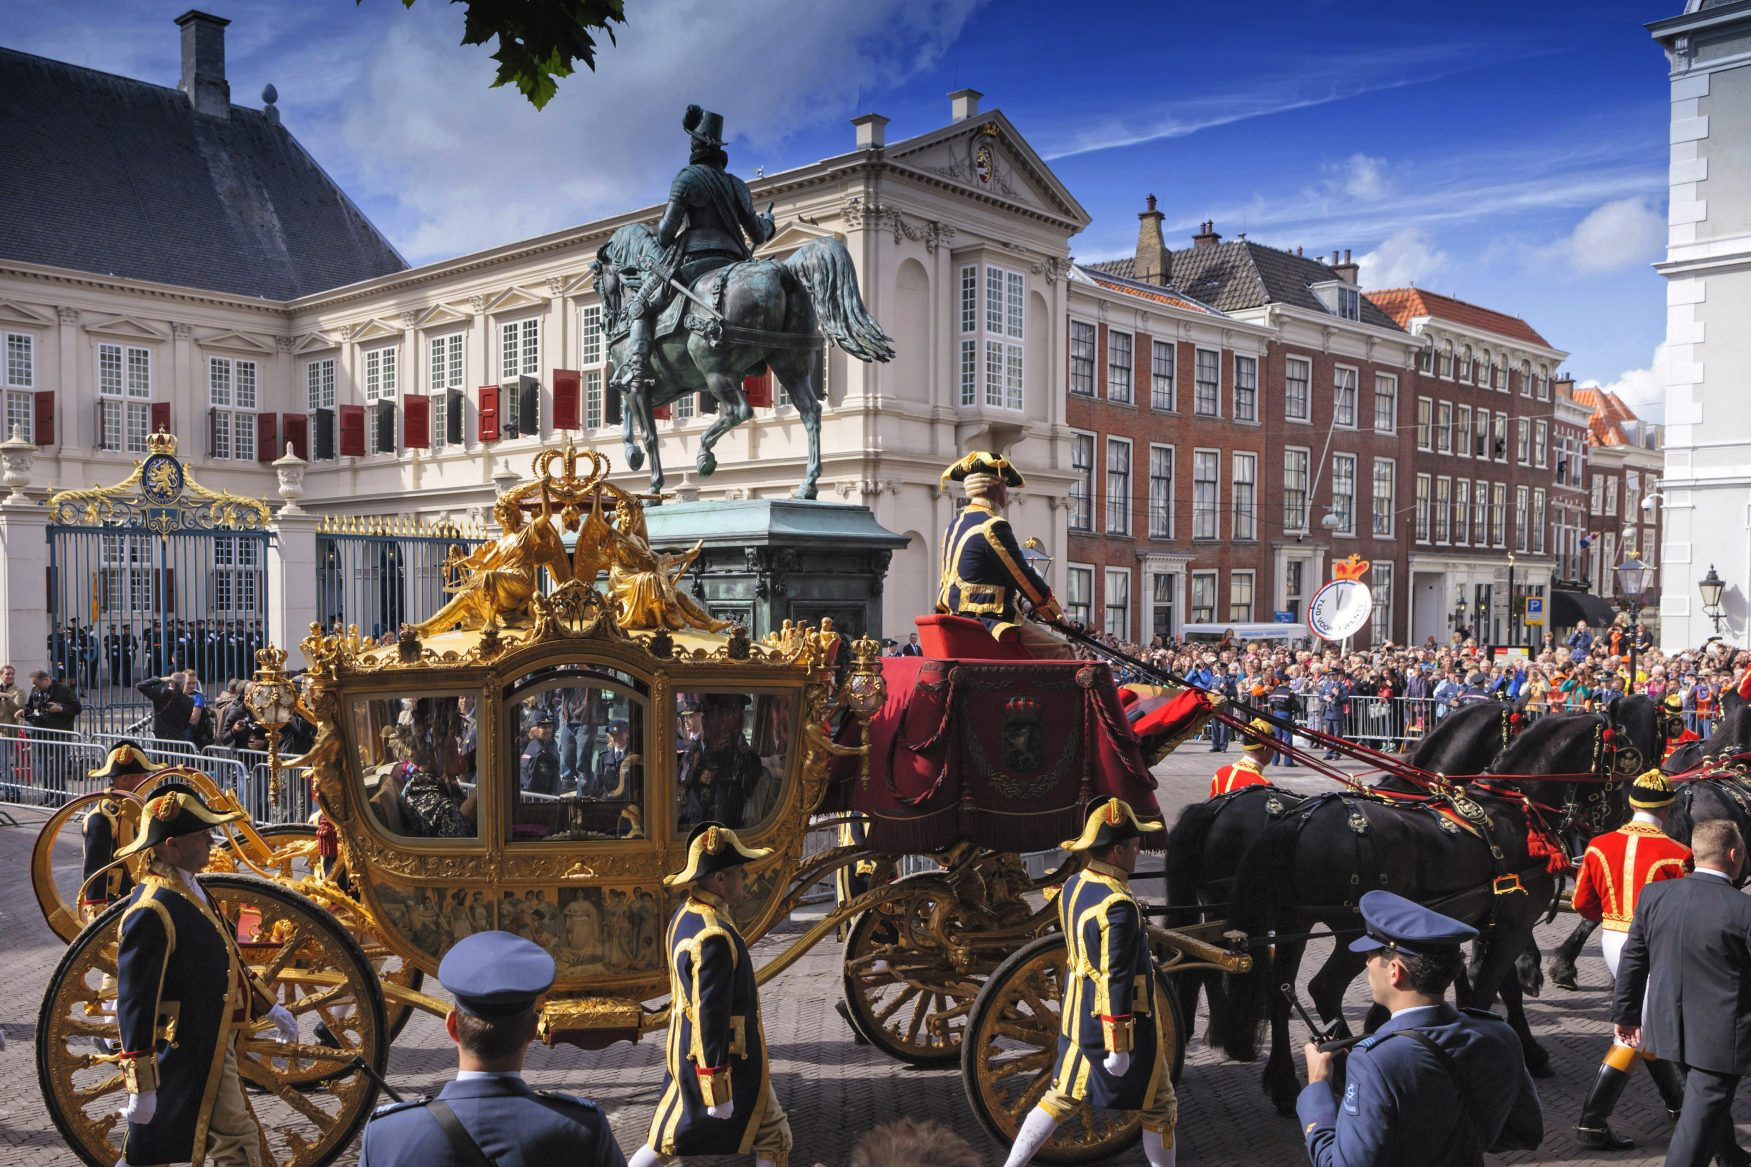 Zeremonie Prinsjesdag in Den Haag_Quelle NBTC